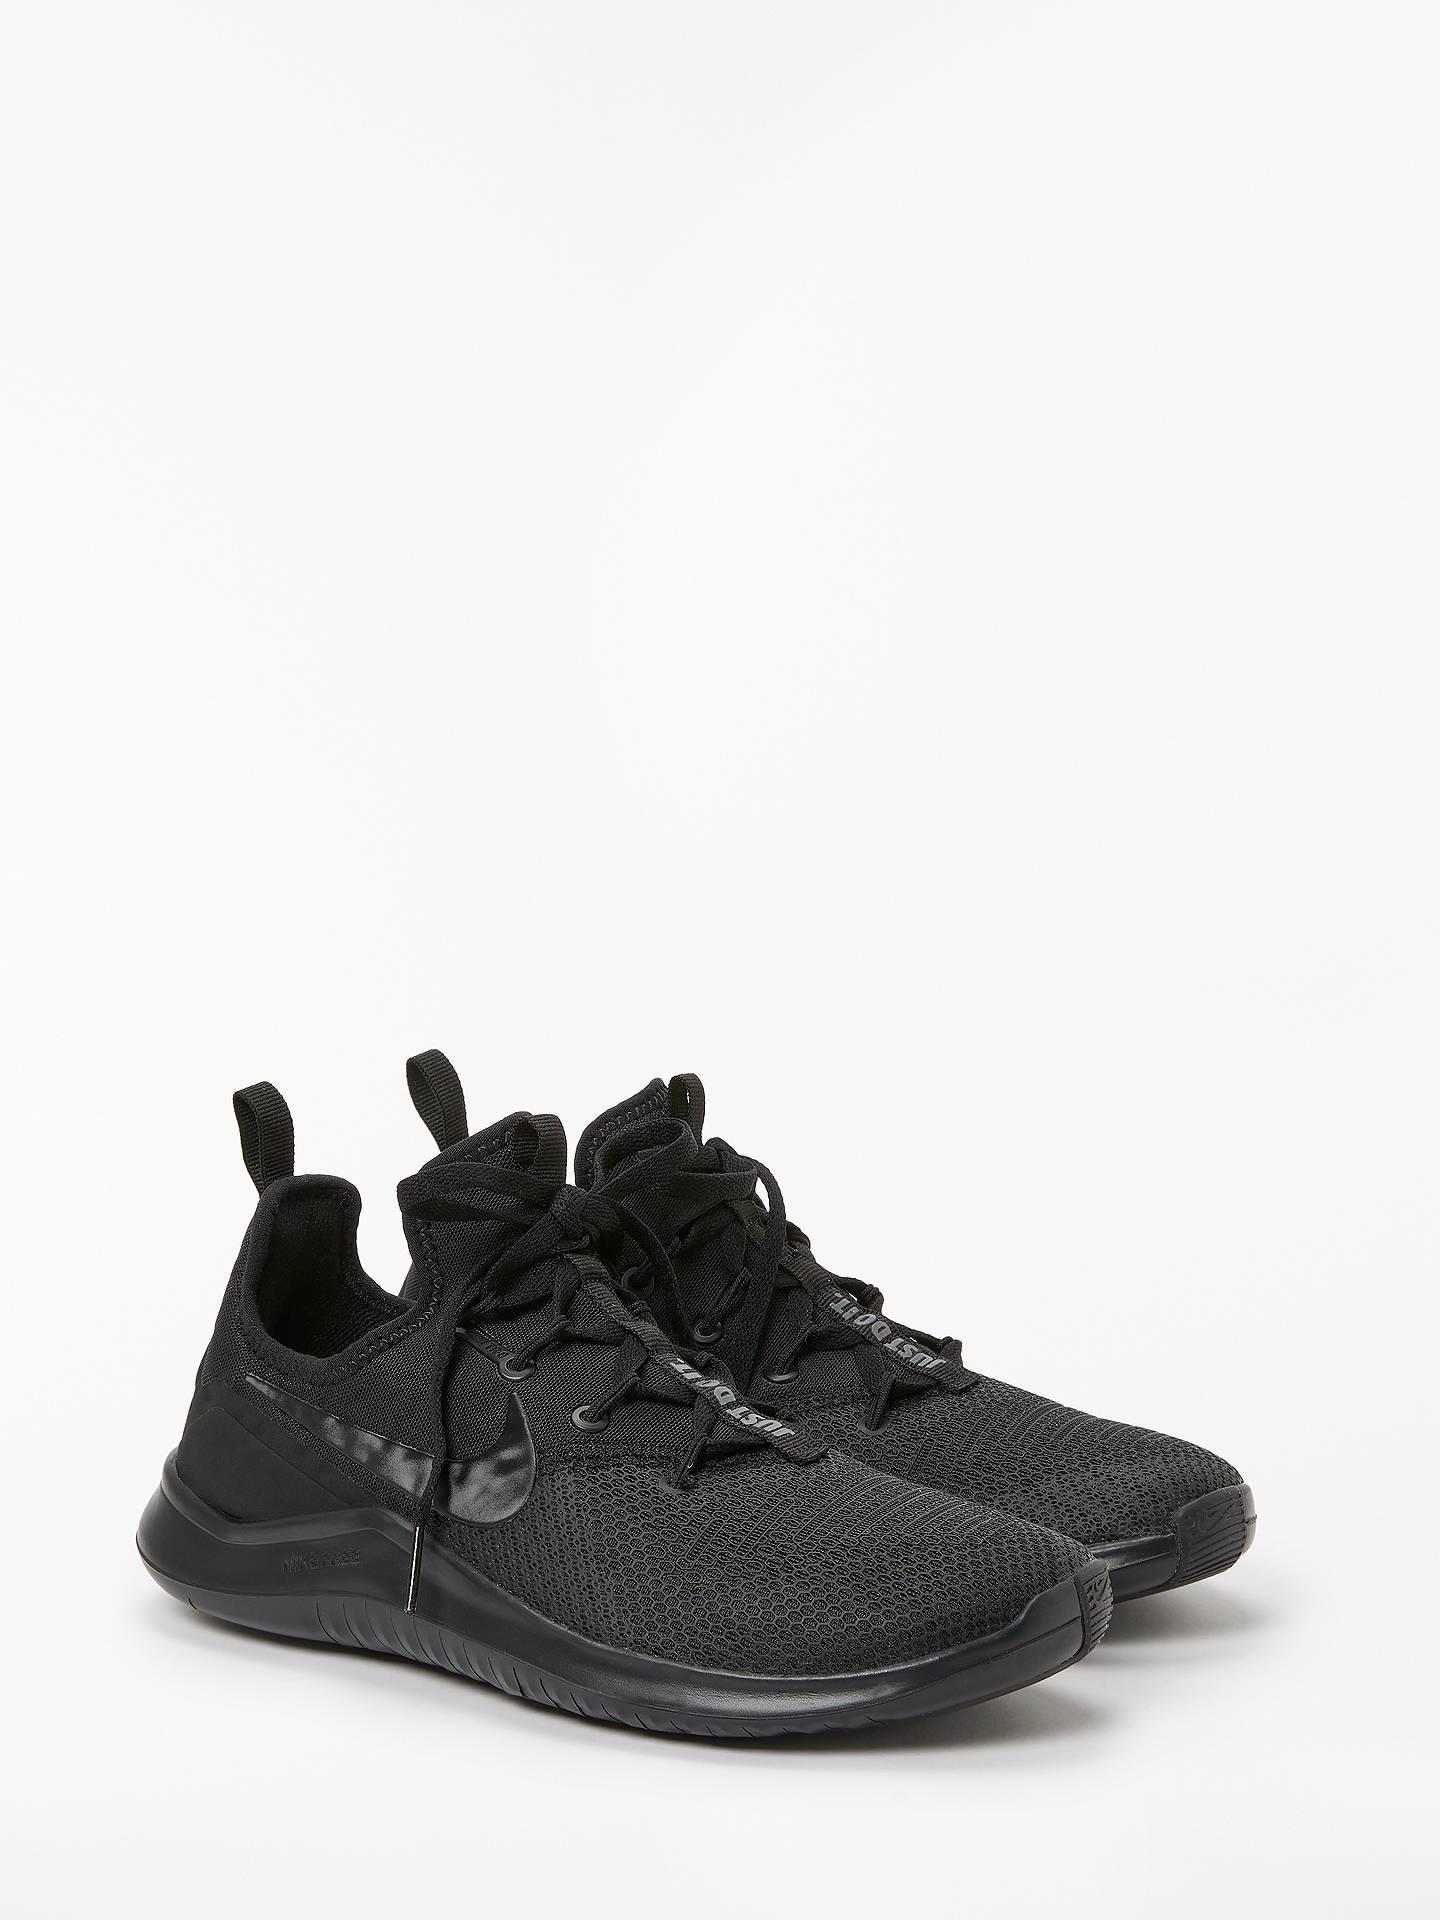 ... BuyNike Free TR 8 Women s Training Shoes c9a40af12